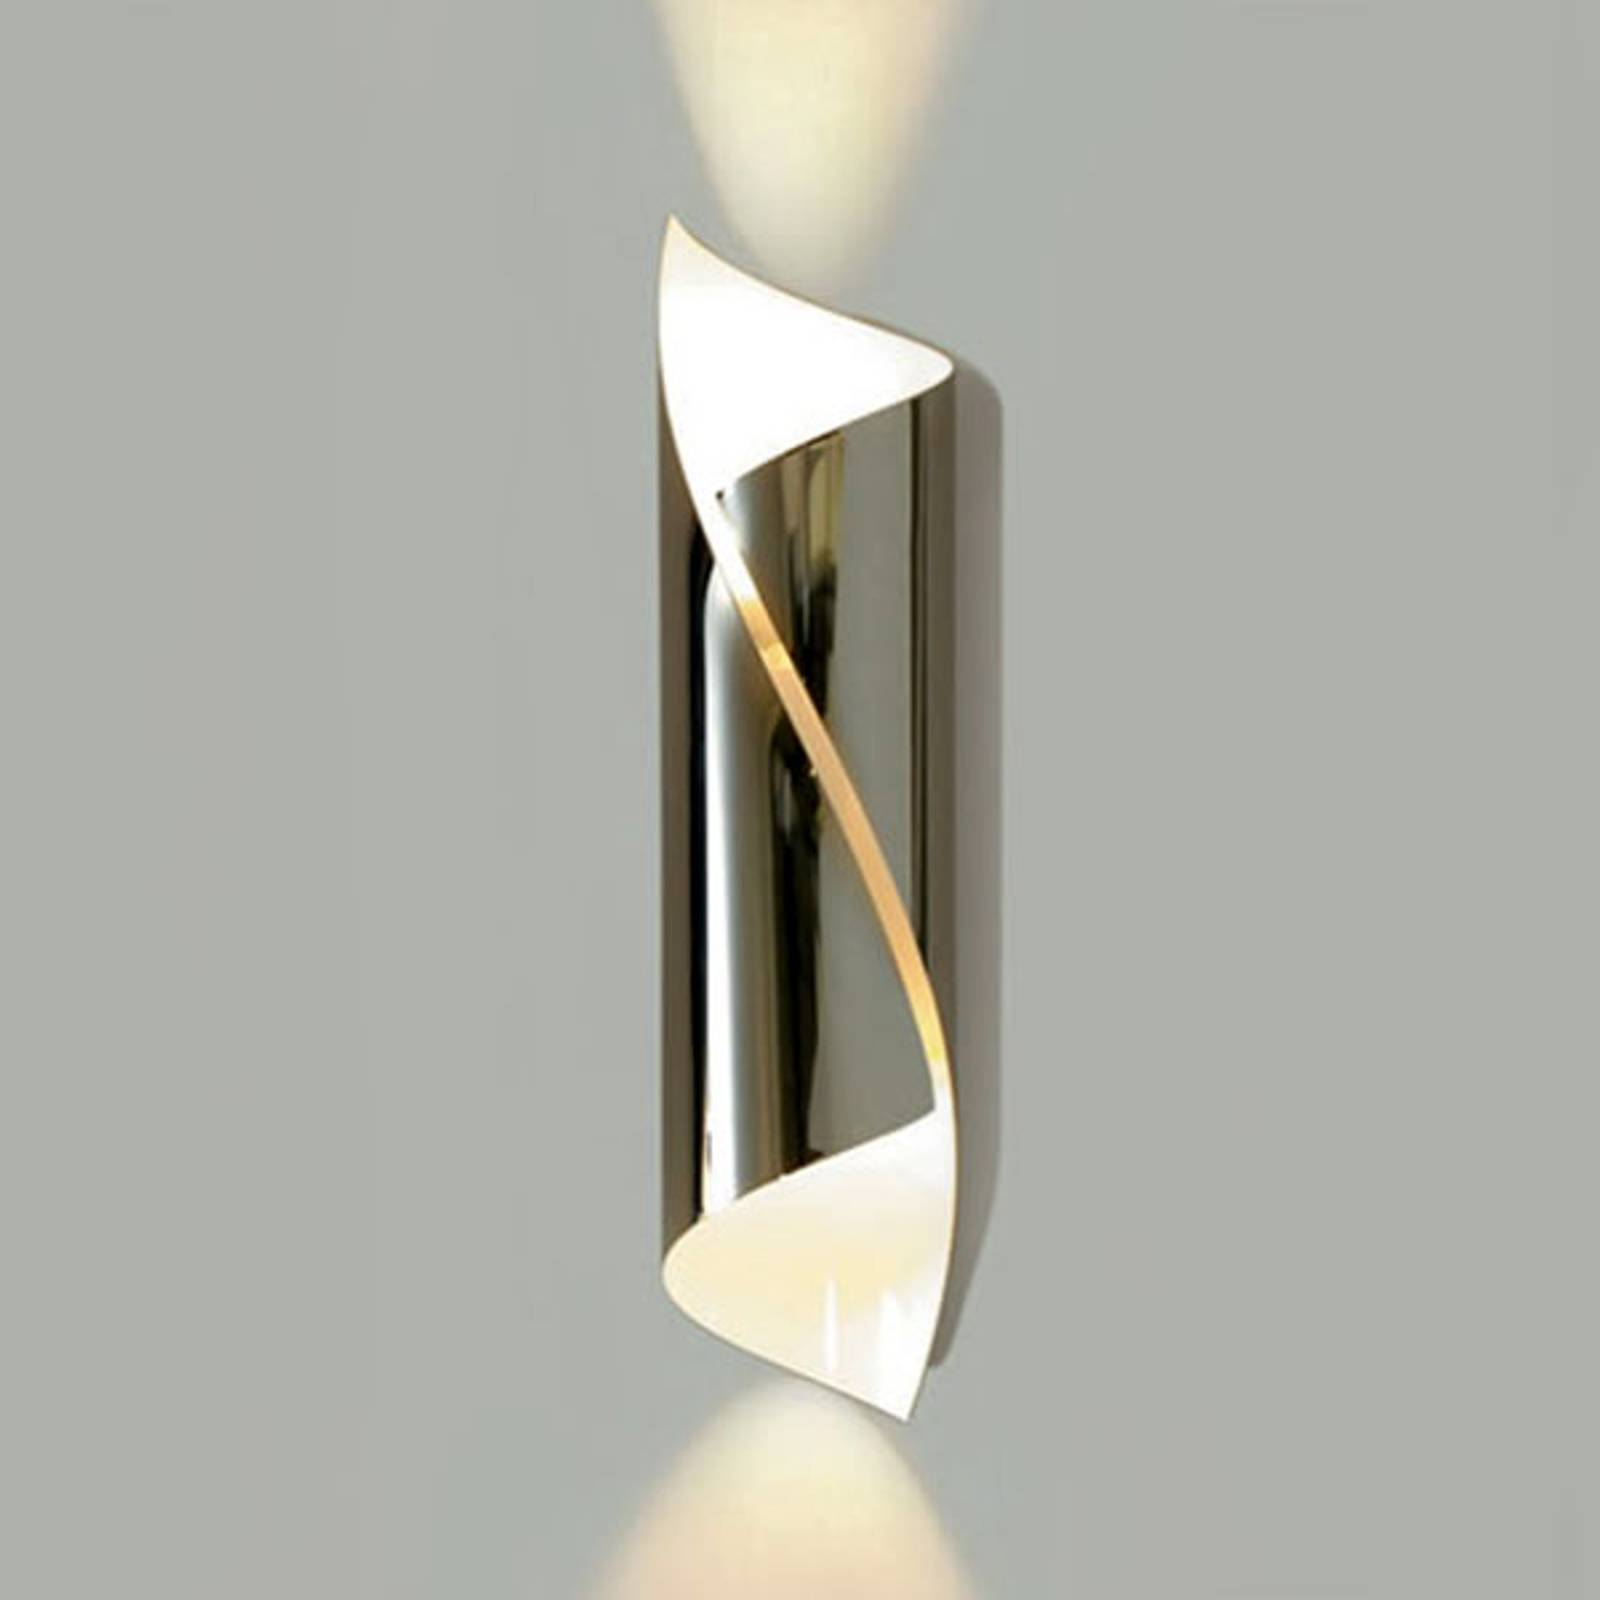 Knikerboker Hué LED-Wandleuchte Höhe 54 cm chrom